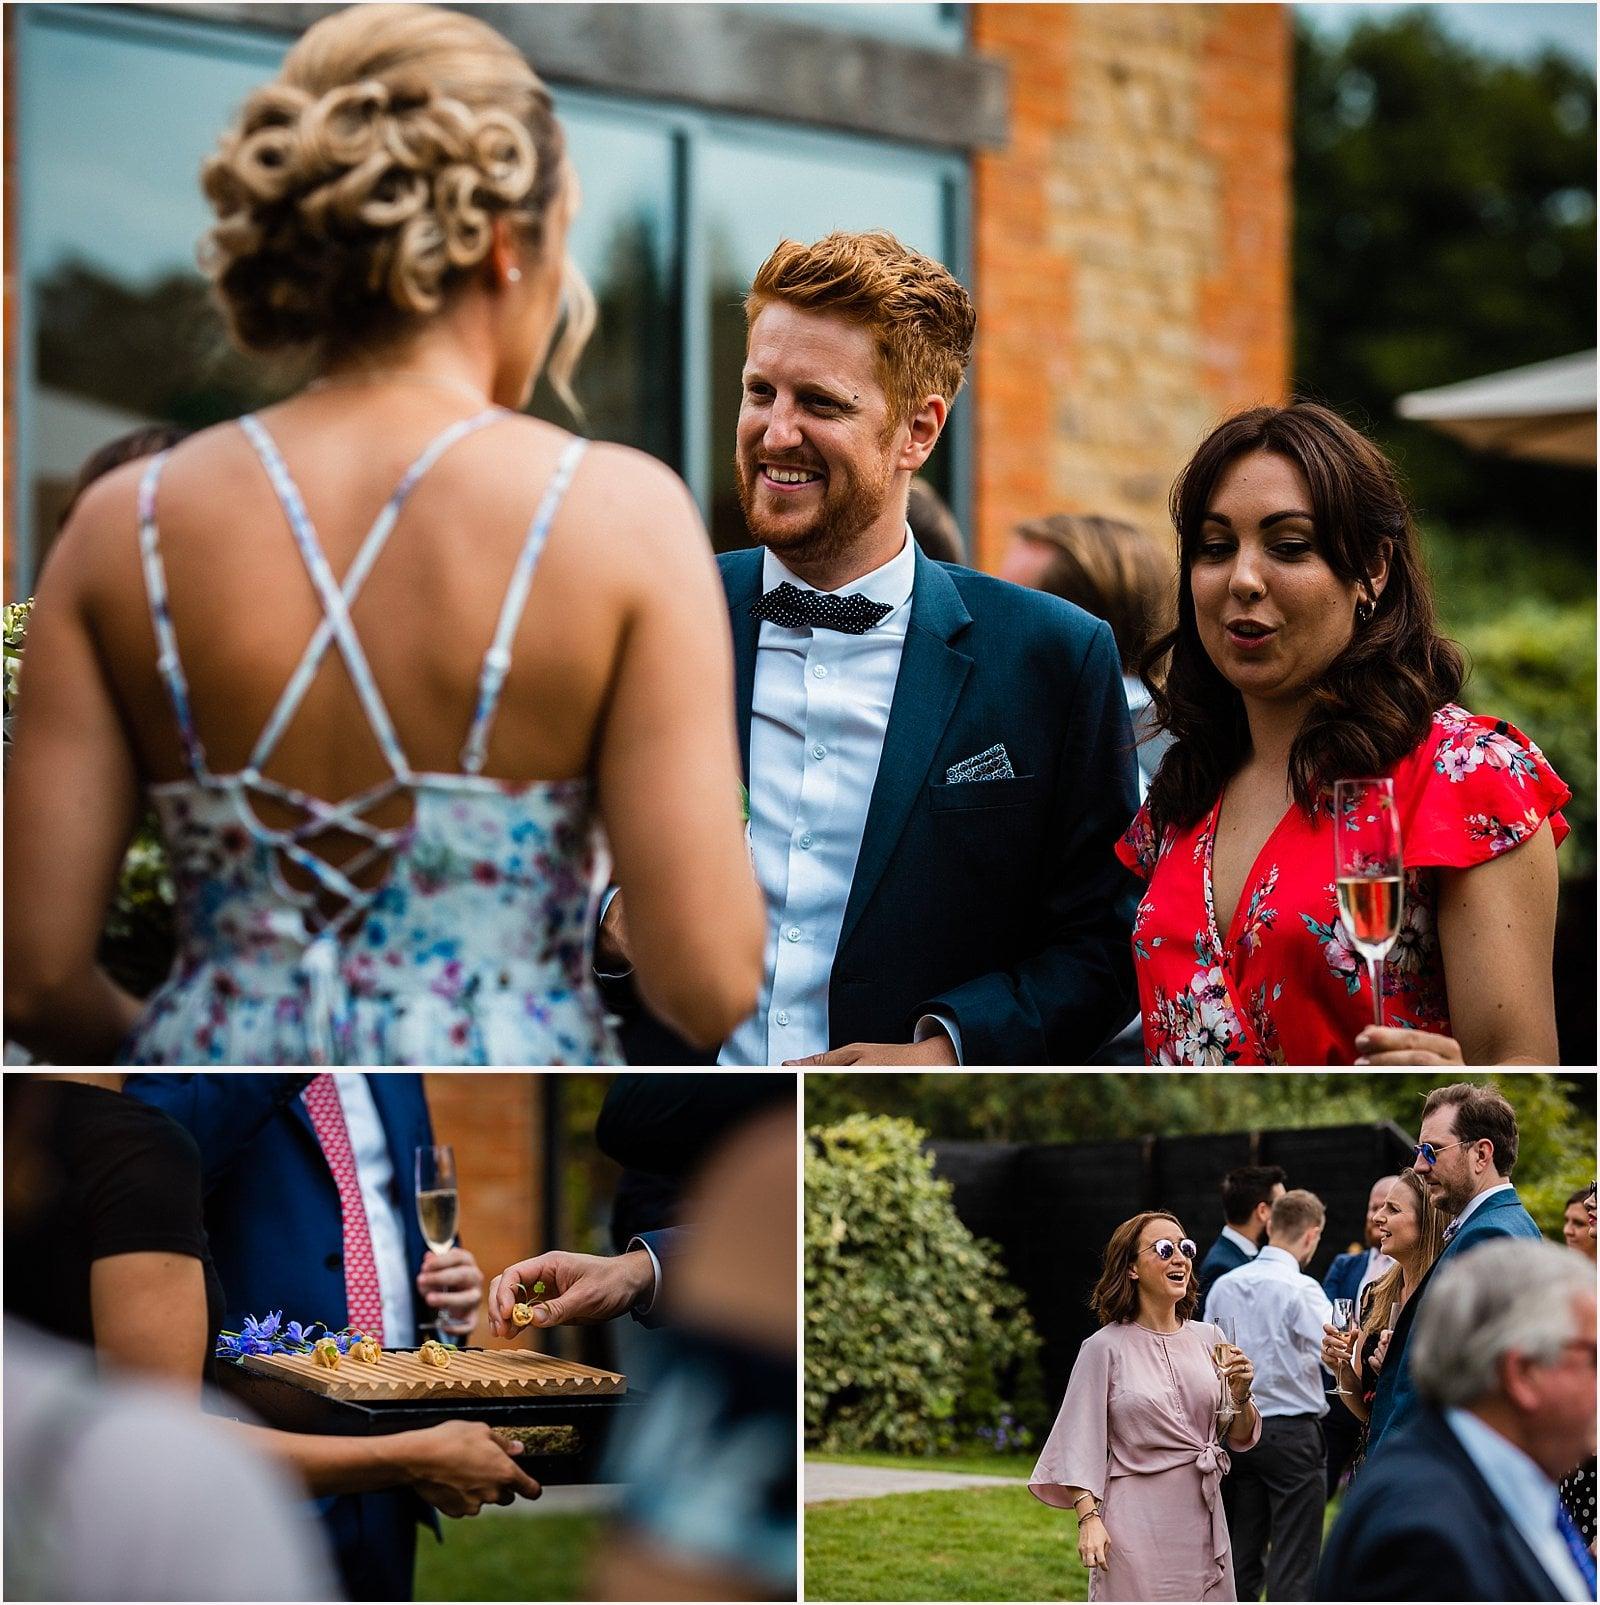 Millbridge Court Wedding - stunning summer wedding - wedding photography 40